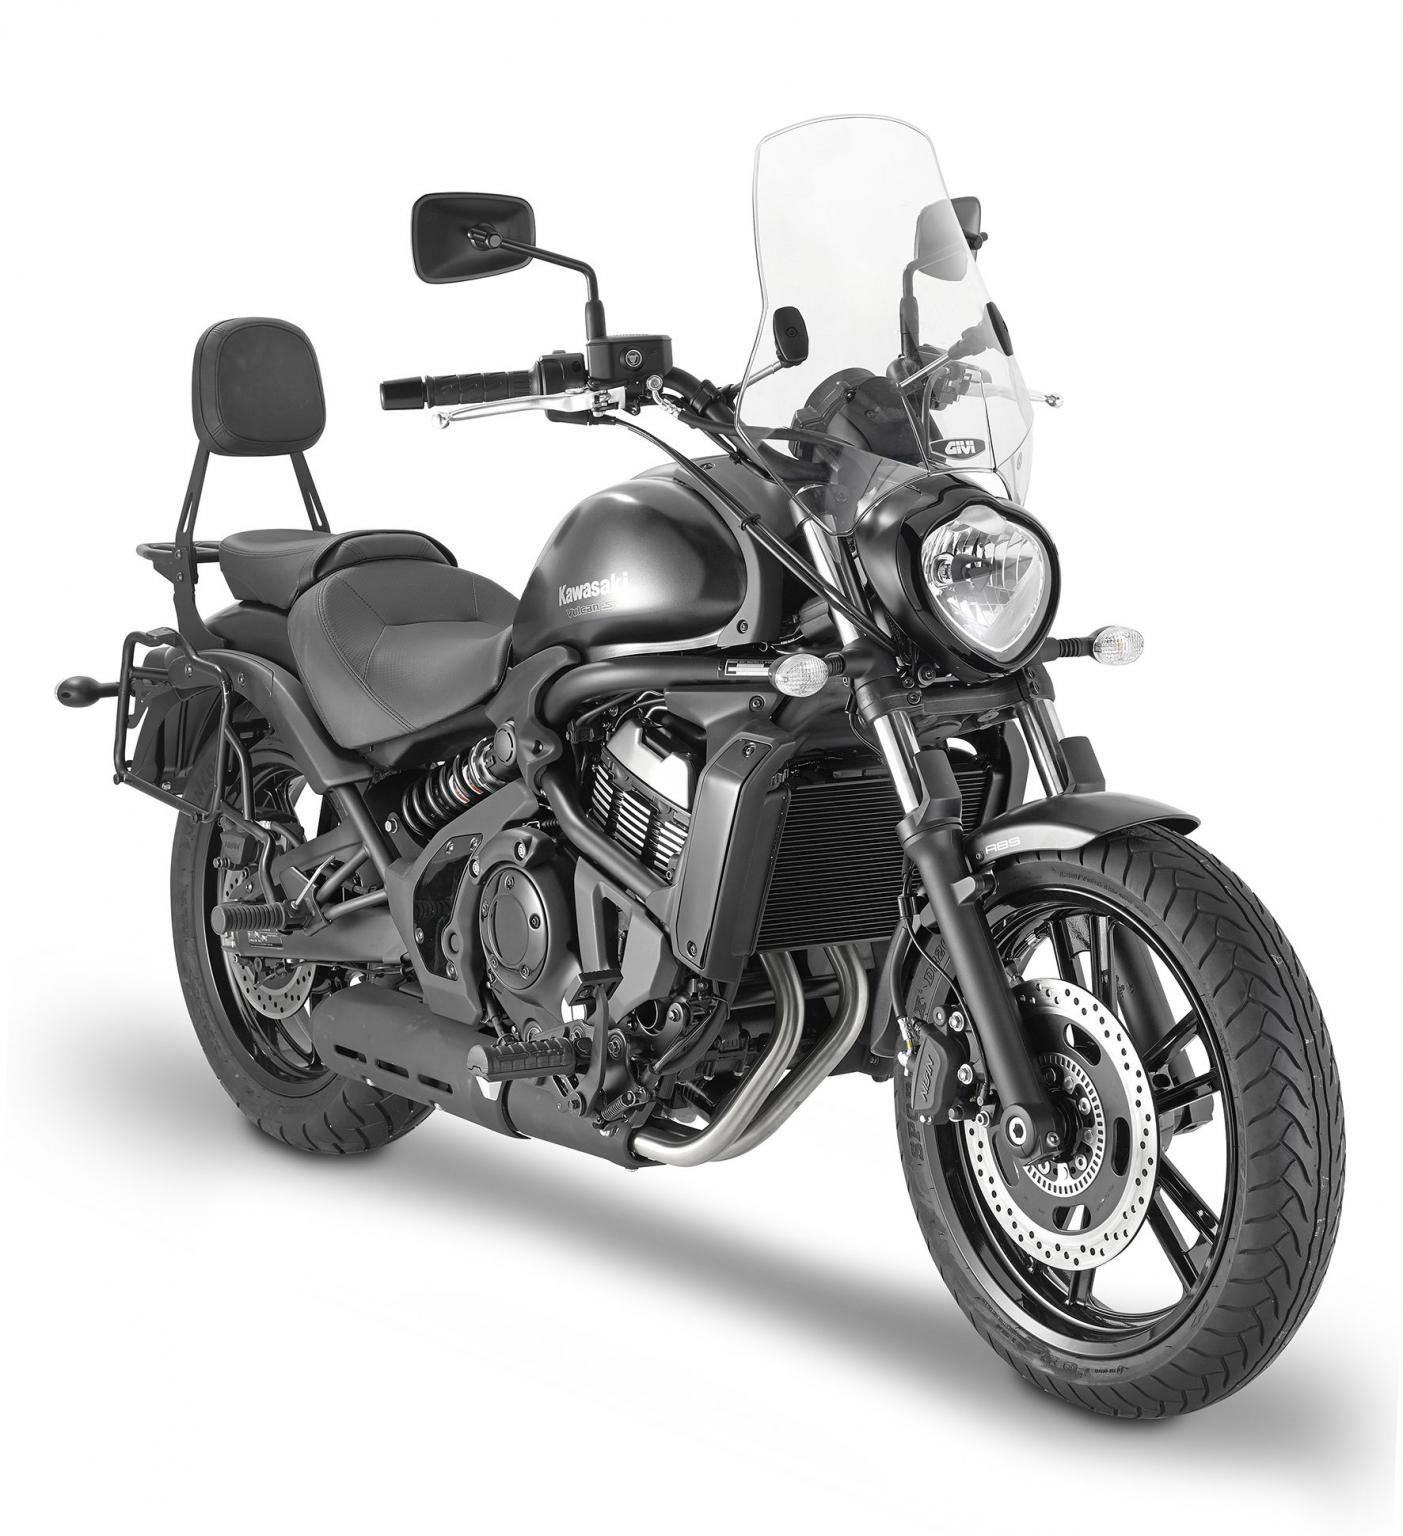 Kawasaki Gtr Accessories